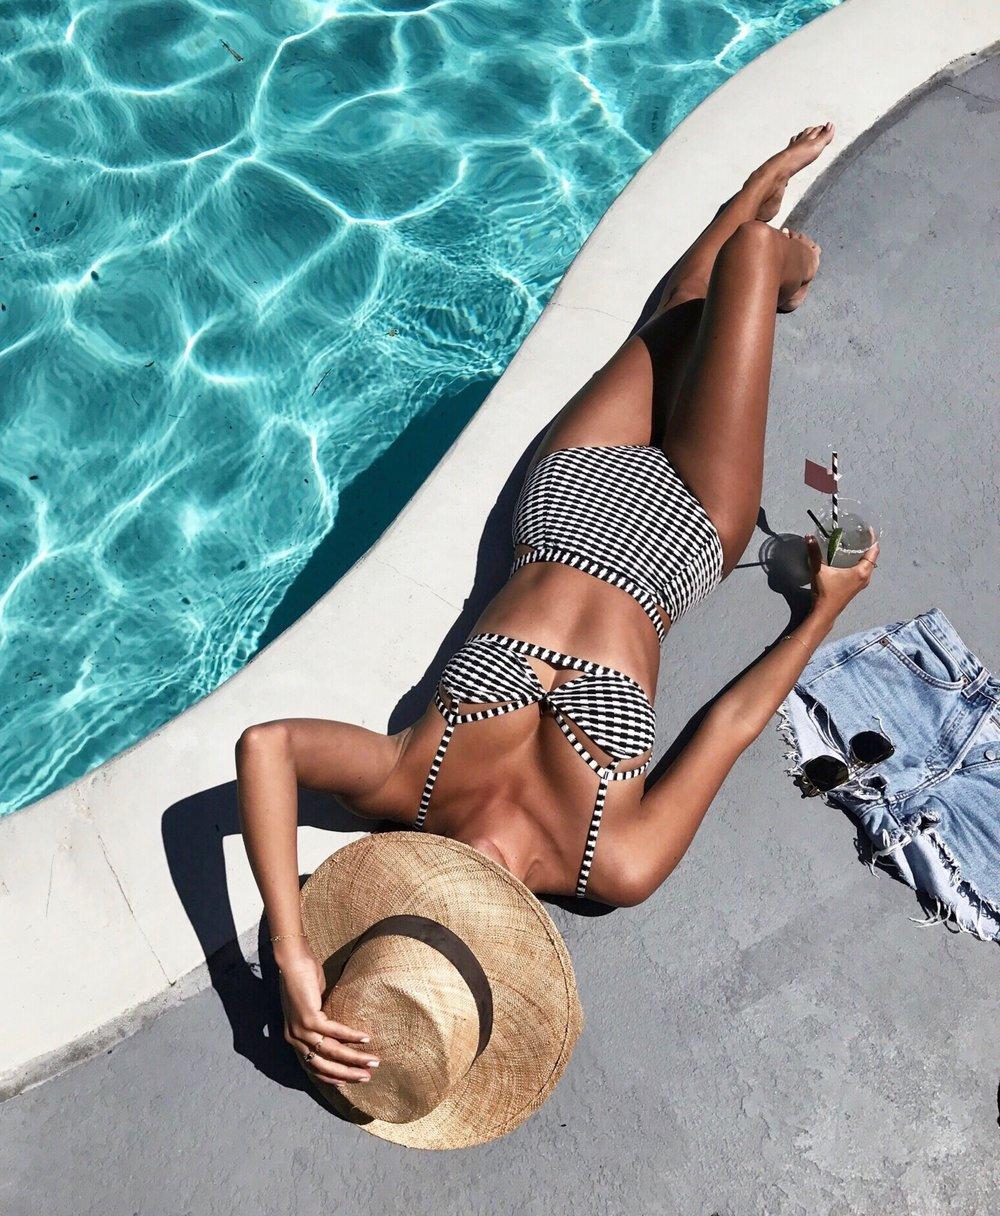 gingham bikini, summer 2017 swim styles, W hotel Los Angeles